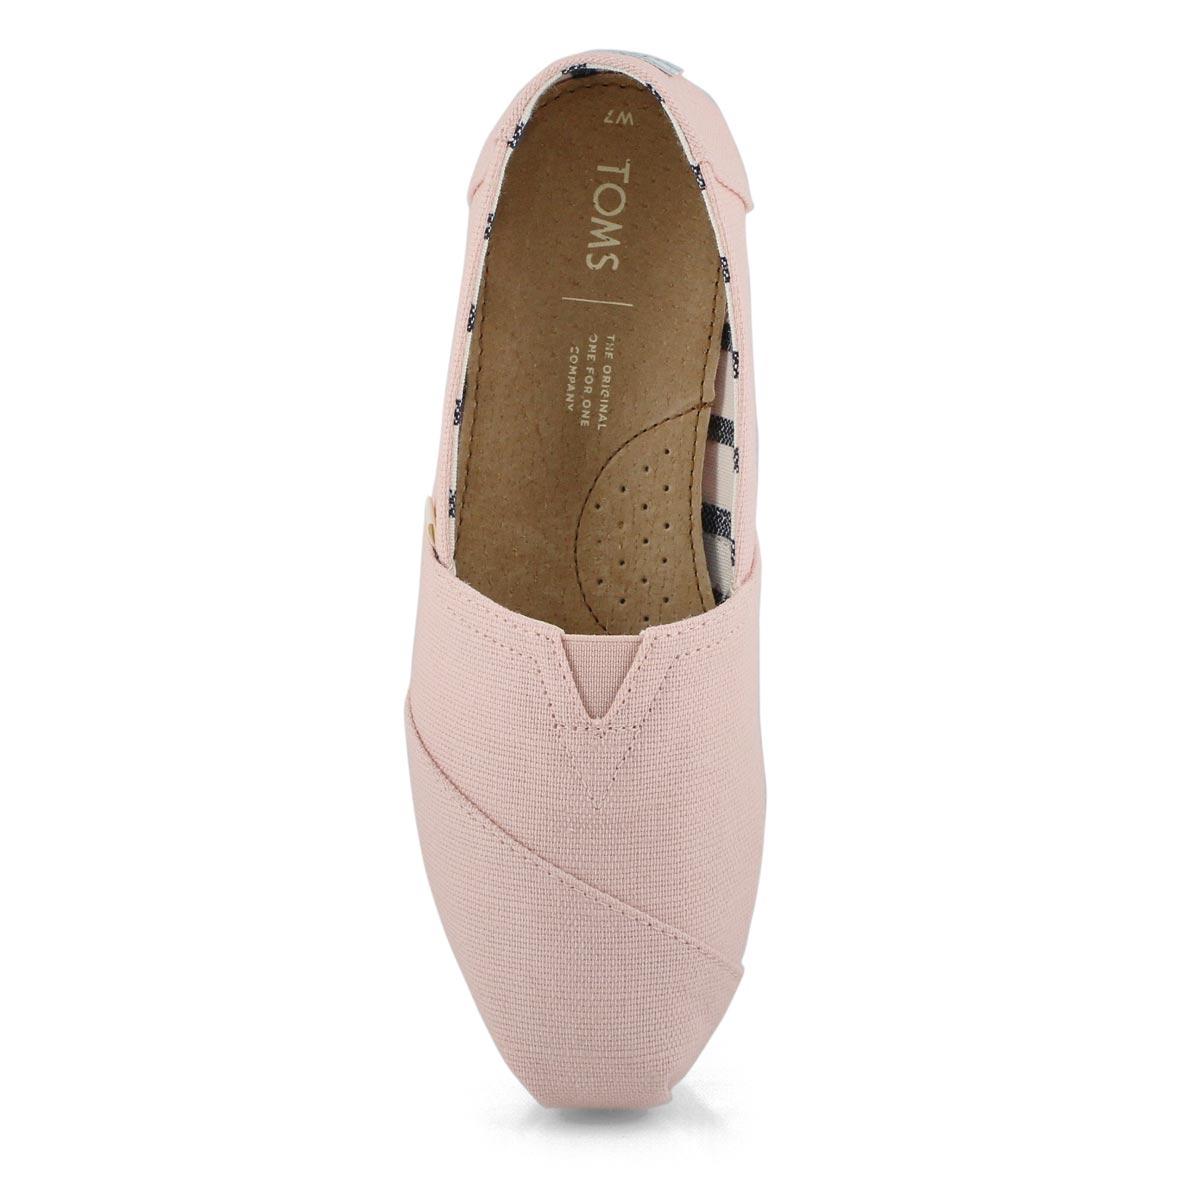 Lds Classic Alpargata spnsh villa loafer